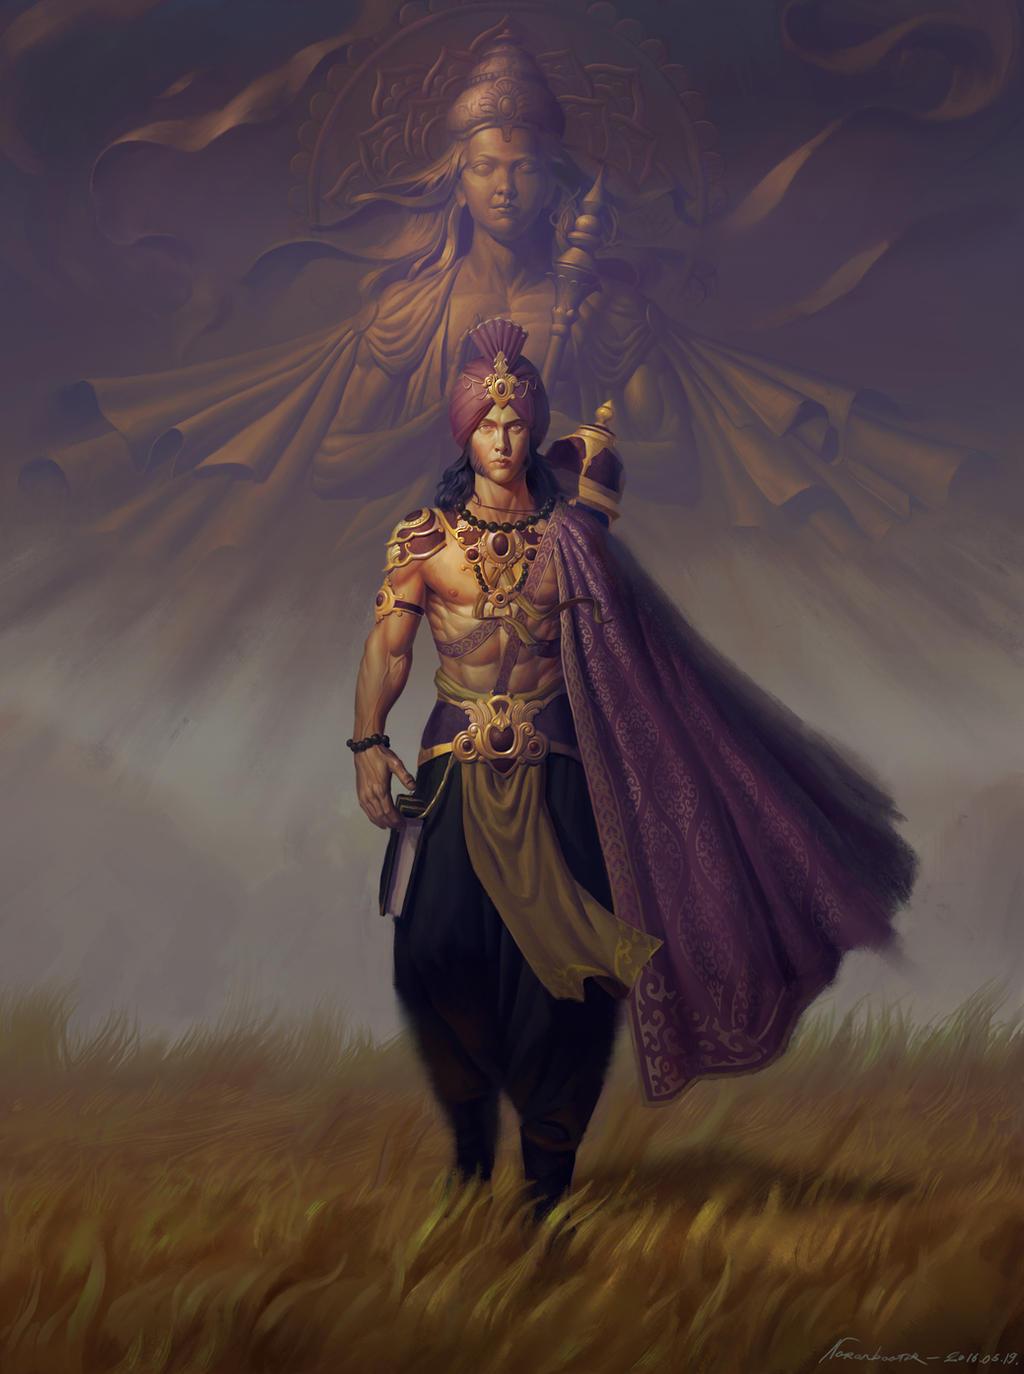 Follower of God by Naranb